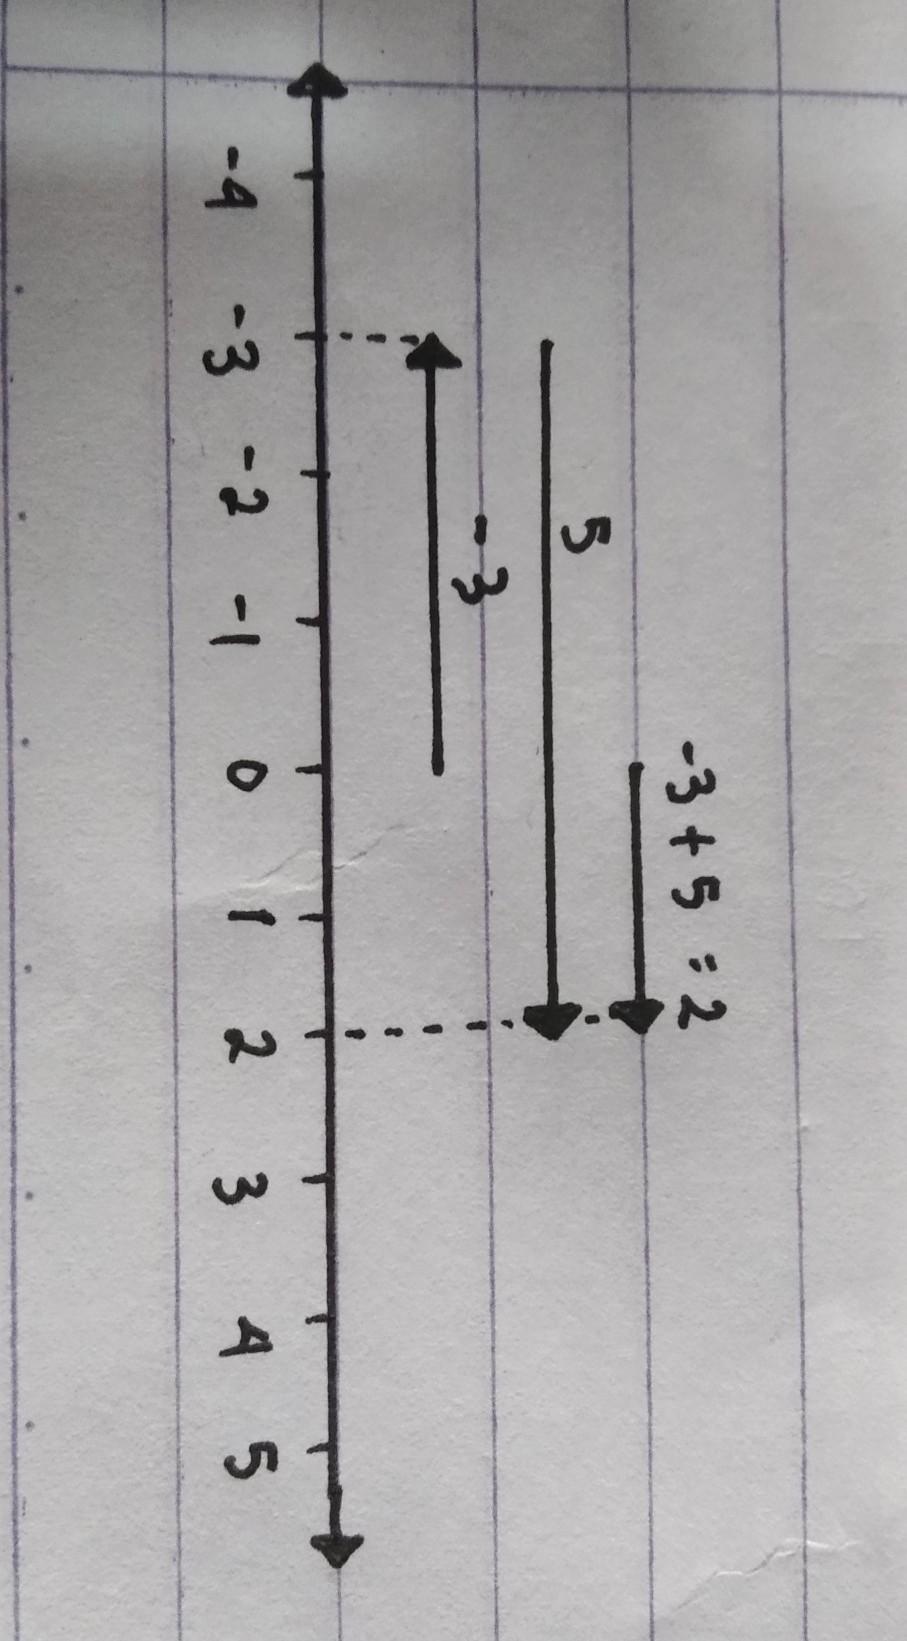 Ubahlah Garis Bilangan Berikut Menjadi Kalimat Matematika : ubahlah, garis, bilangan, berikut, menjadi, kalimat, matematika, Ubahlah, Kalimat, Matematika, Berikut, Dalam, Garis, Bilangan, -3+5=2, Brainly.co.id